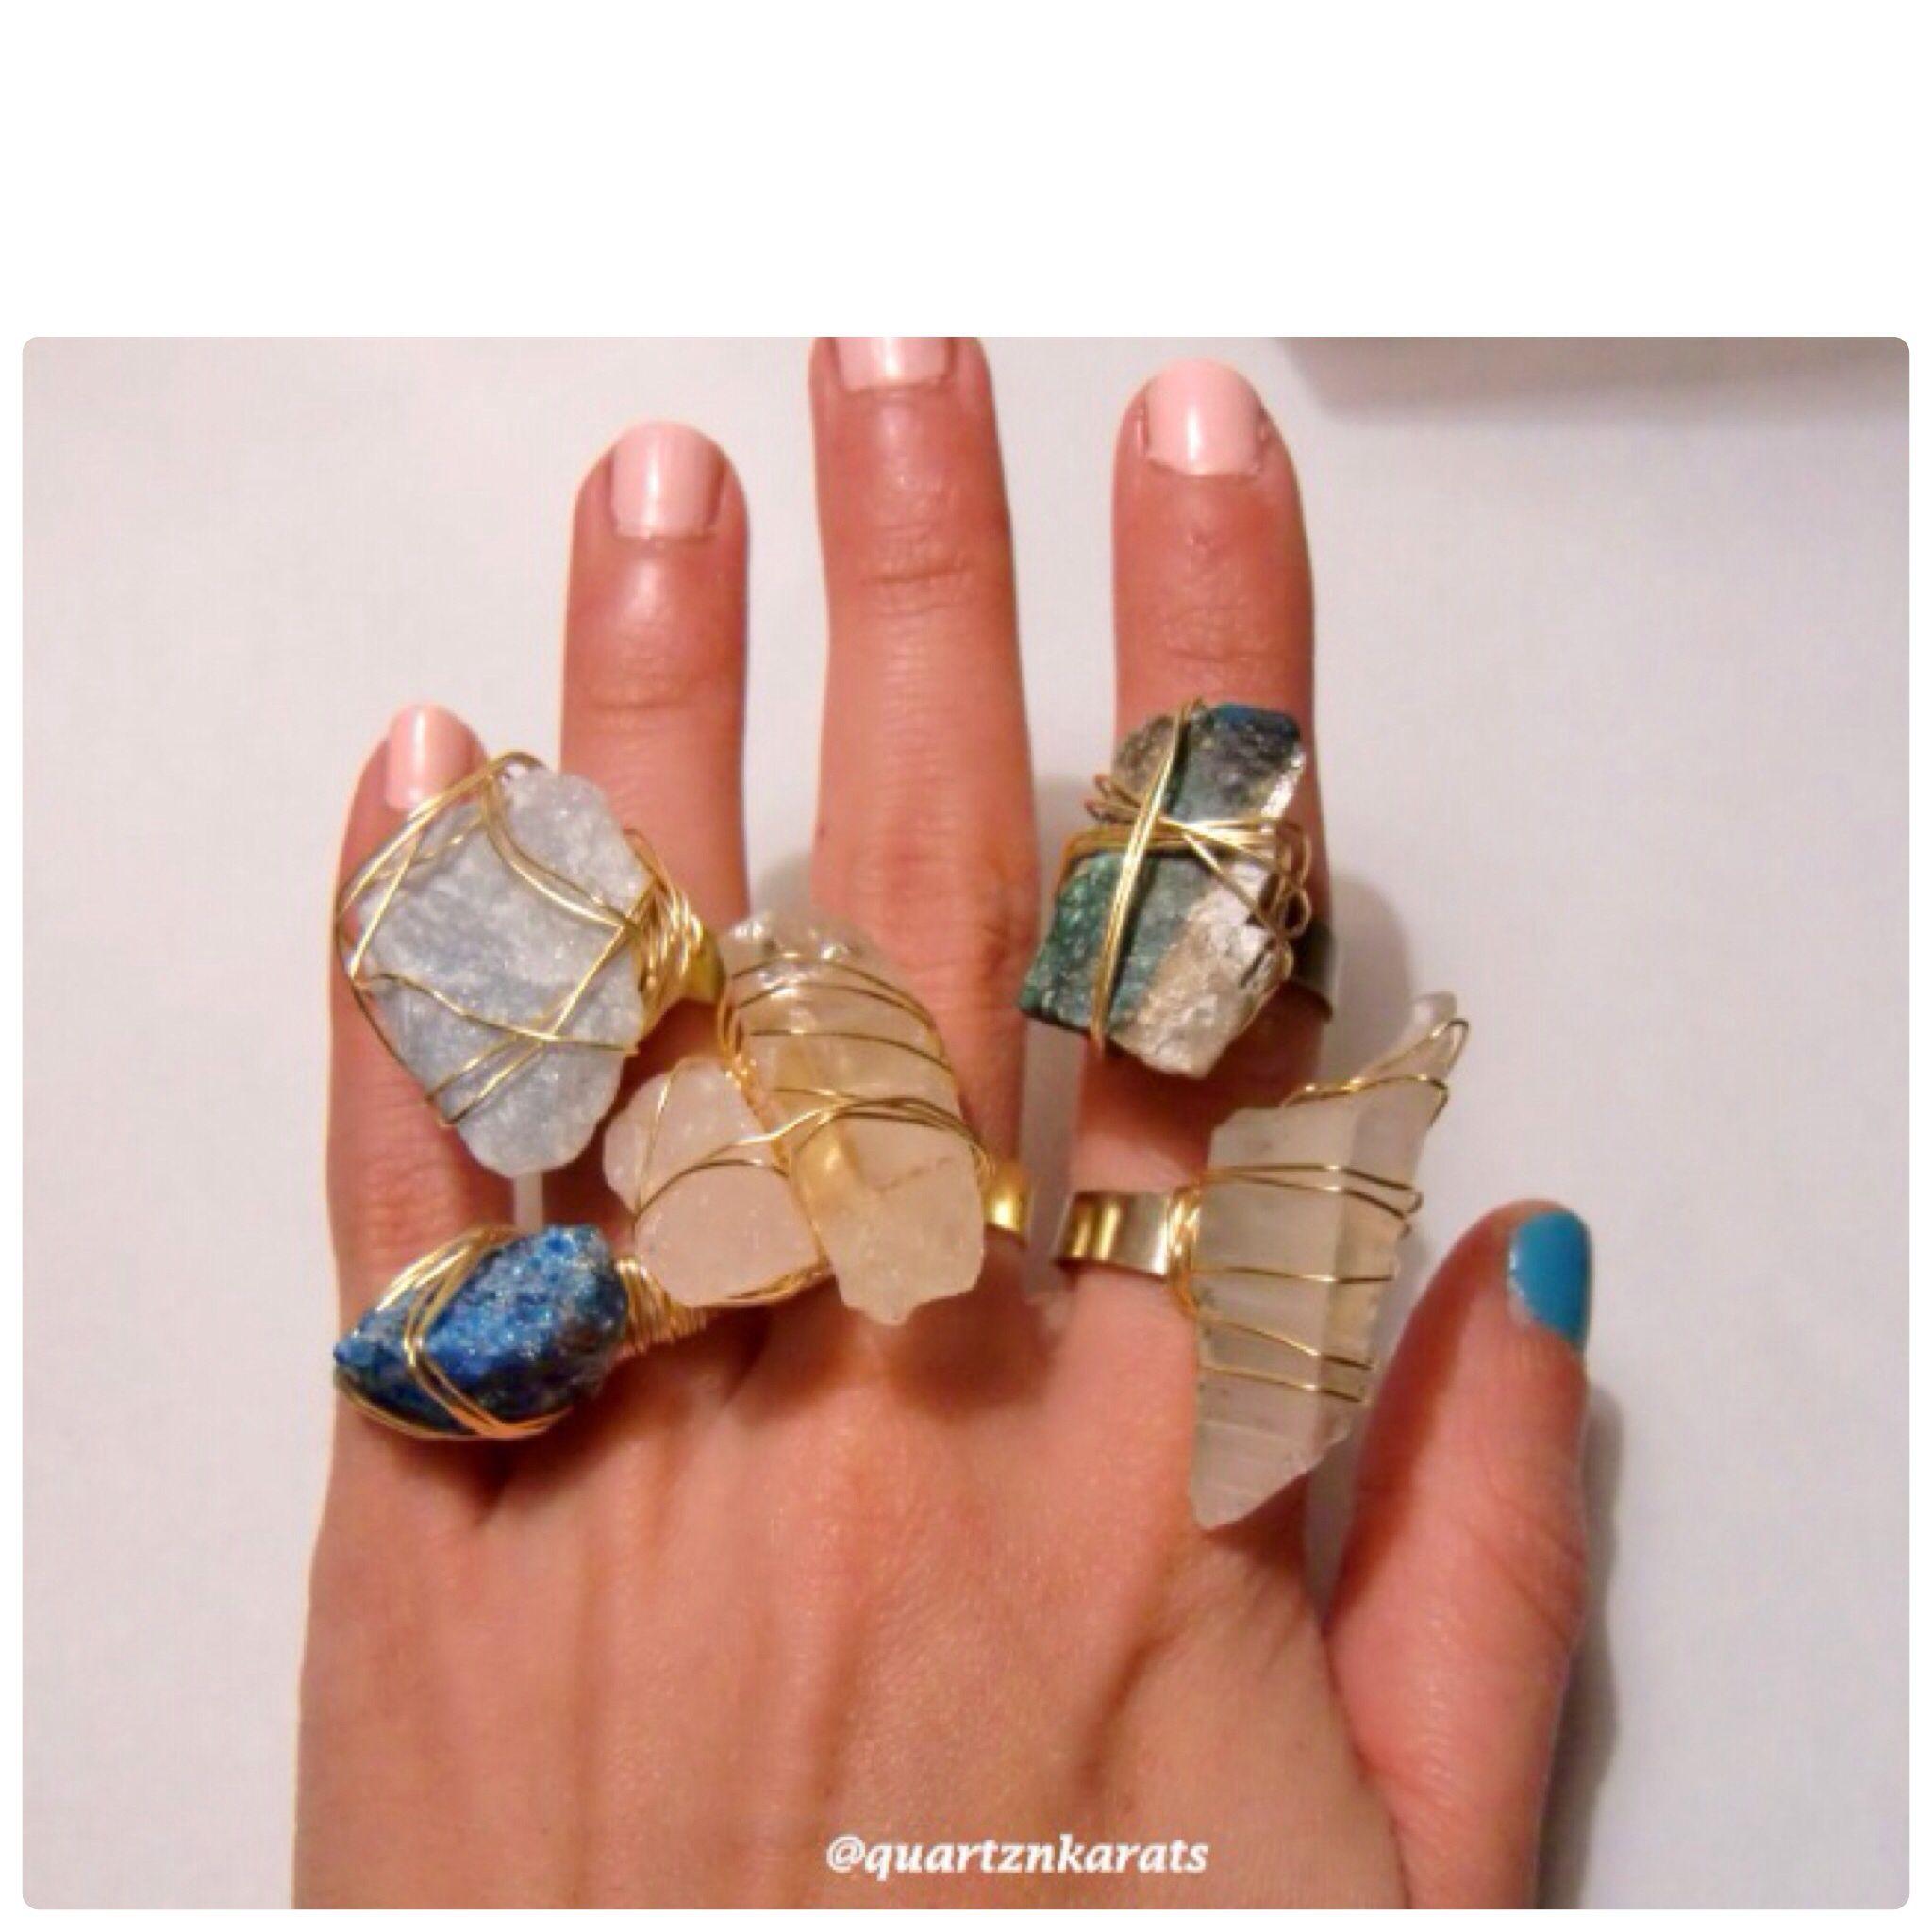 Www.etsy.com/shop/quartznkarats #crystal #trendy #rings #jewelry #etsy #shop #wire #wrapped #raw #healing #gems #christmas #gift